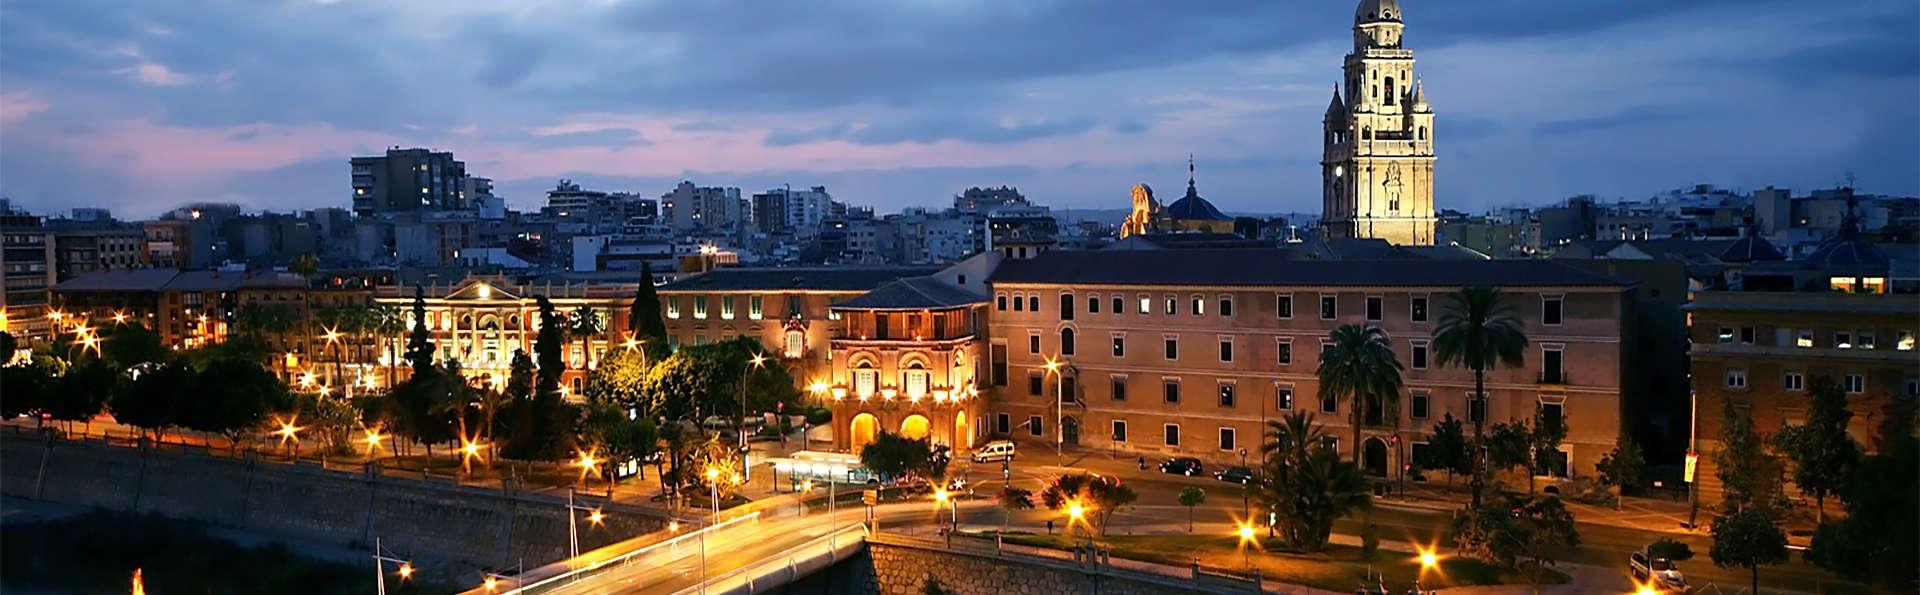 Hotel Arco de San Juan - EDIT_destination.jpg